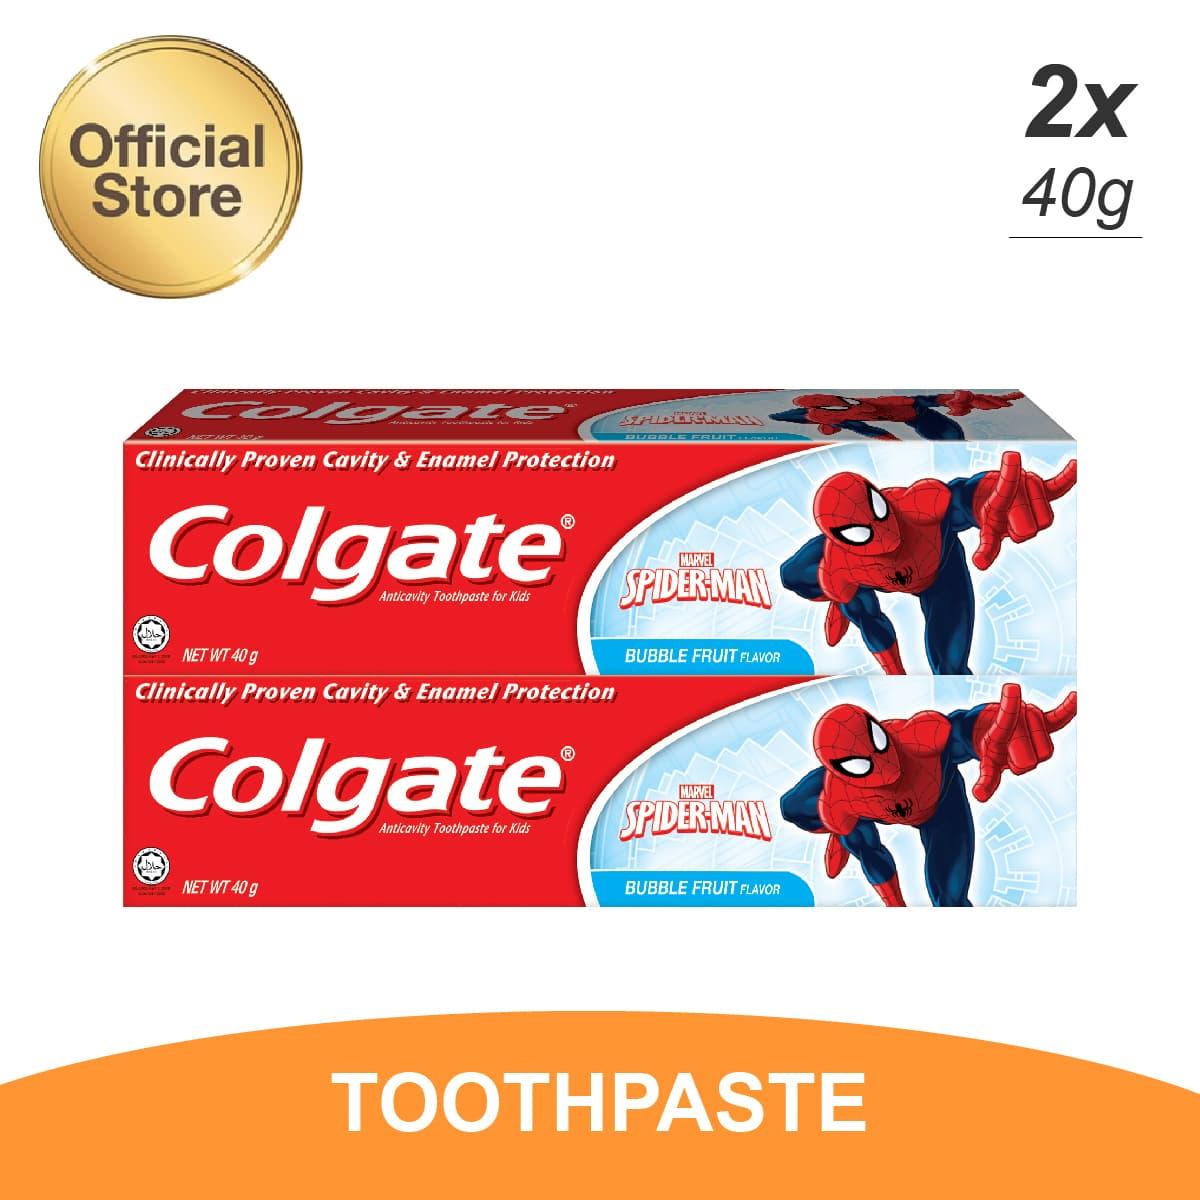 Jual Produk Promo Discount Online Termurah Colgate Palmolive Official Aroma Therapy Morning Tonic Shower Gel Sabun Mandi 450ml Toothpaste Kids Spiderman 40g 2pc